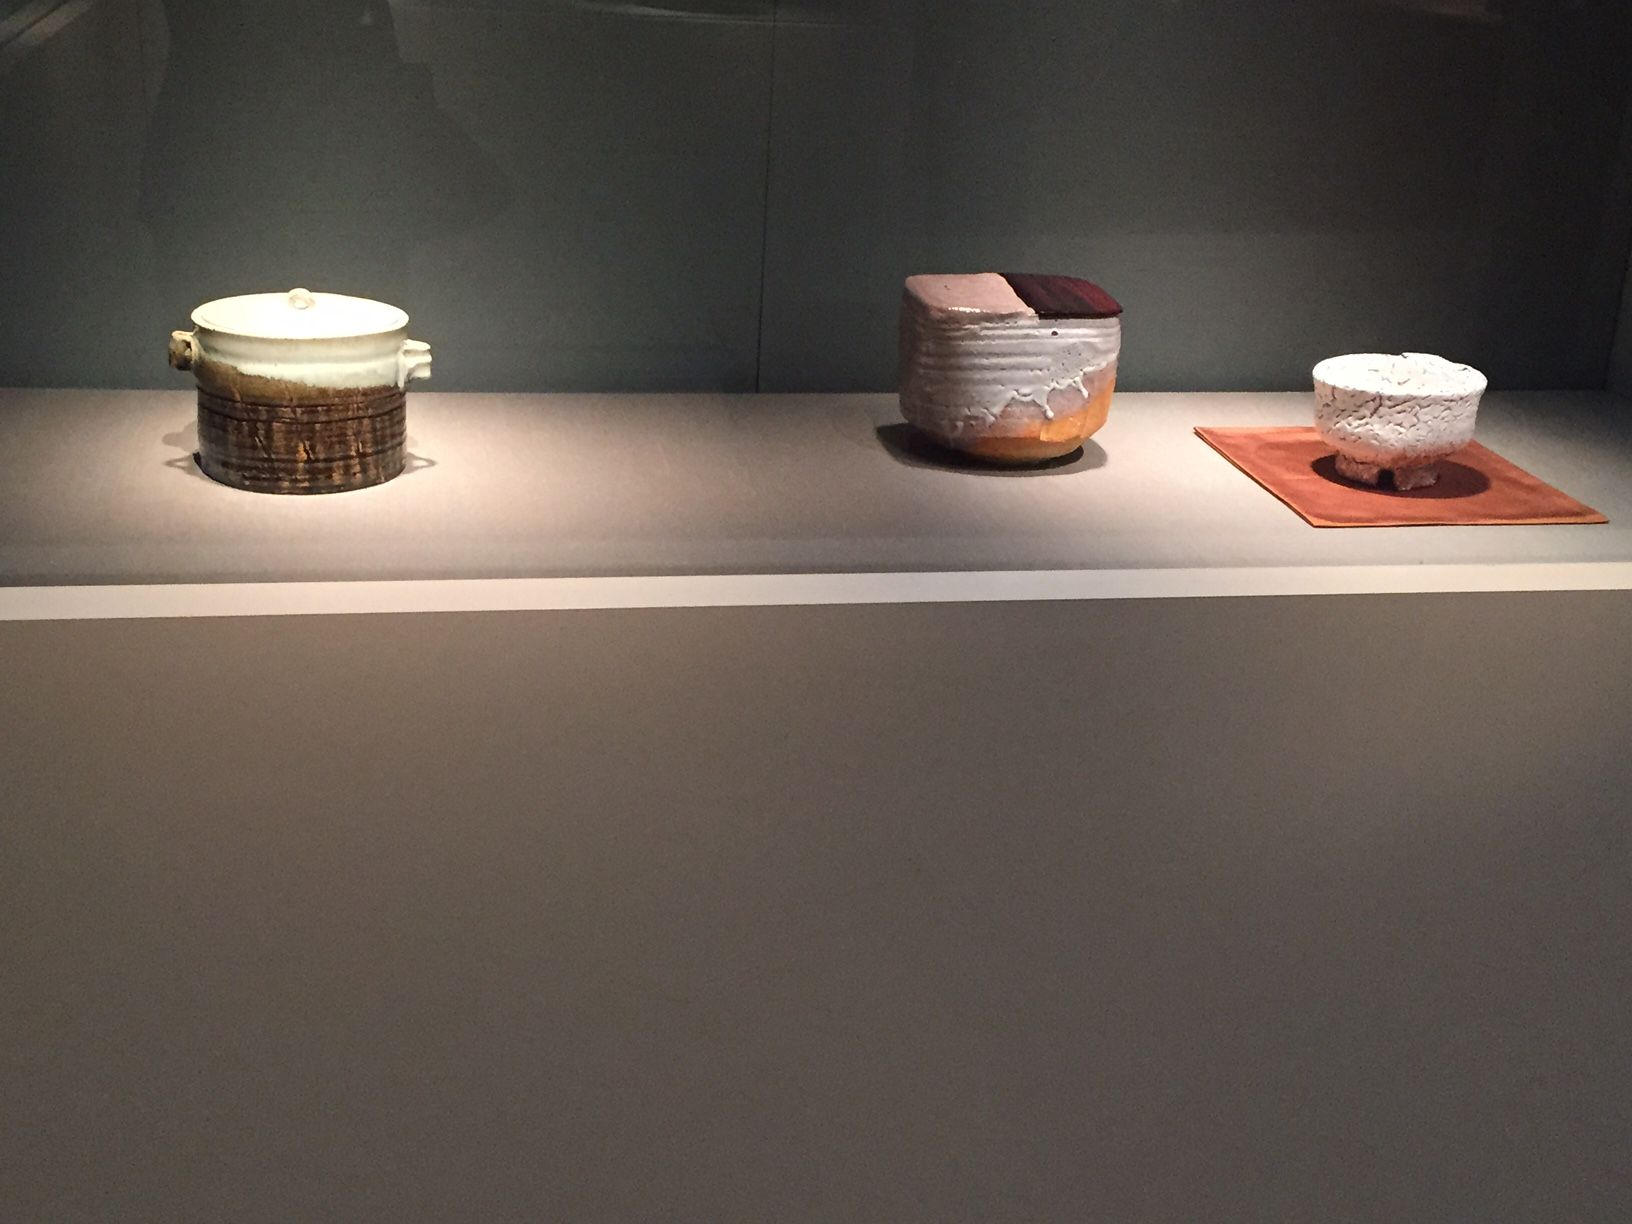 Miwa Kyūwa at the Metropolitan Museum of Art